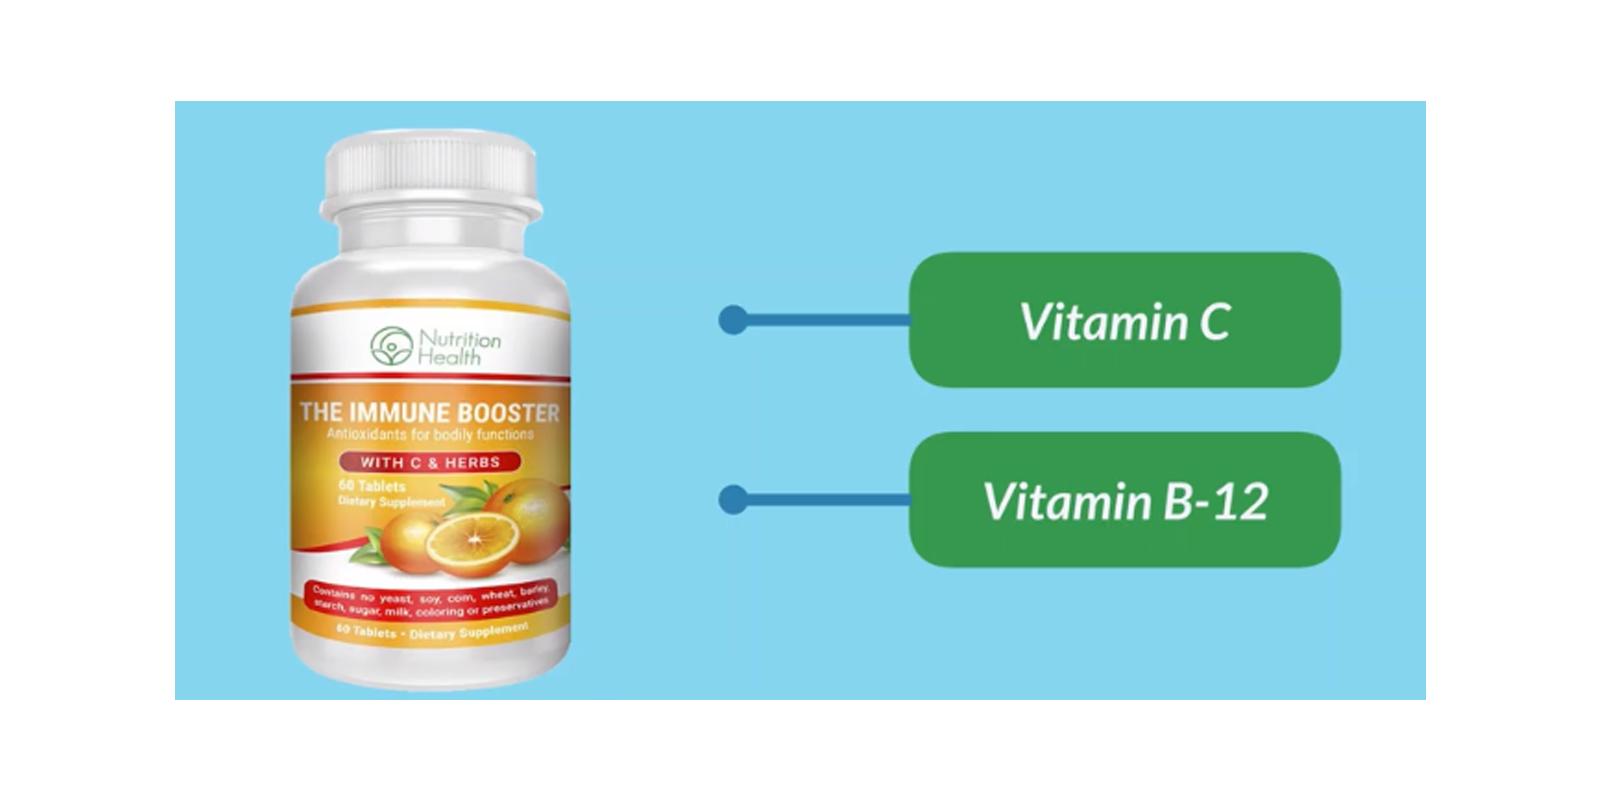 Nutrition Health Immune Booster supplement